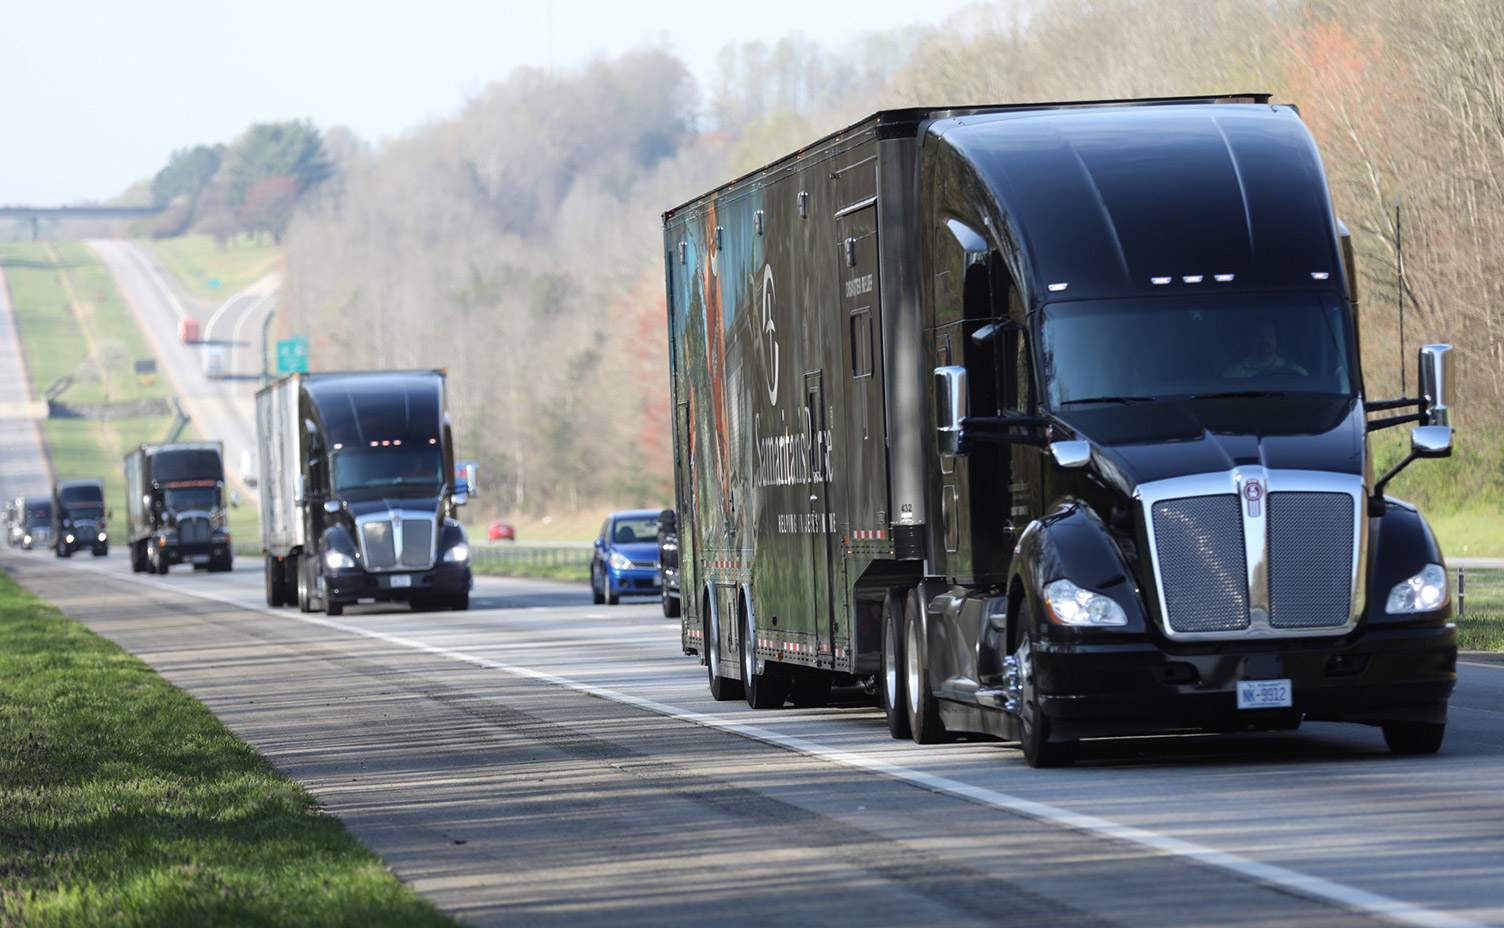 Samaritan's Purse trucks roll to NYC